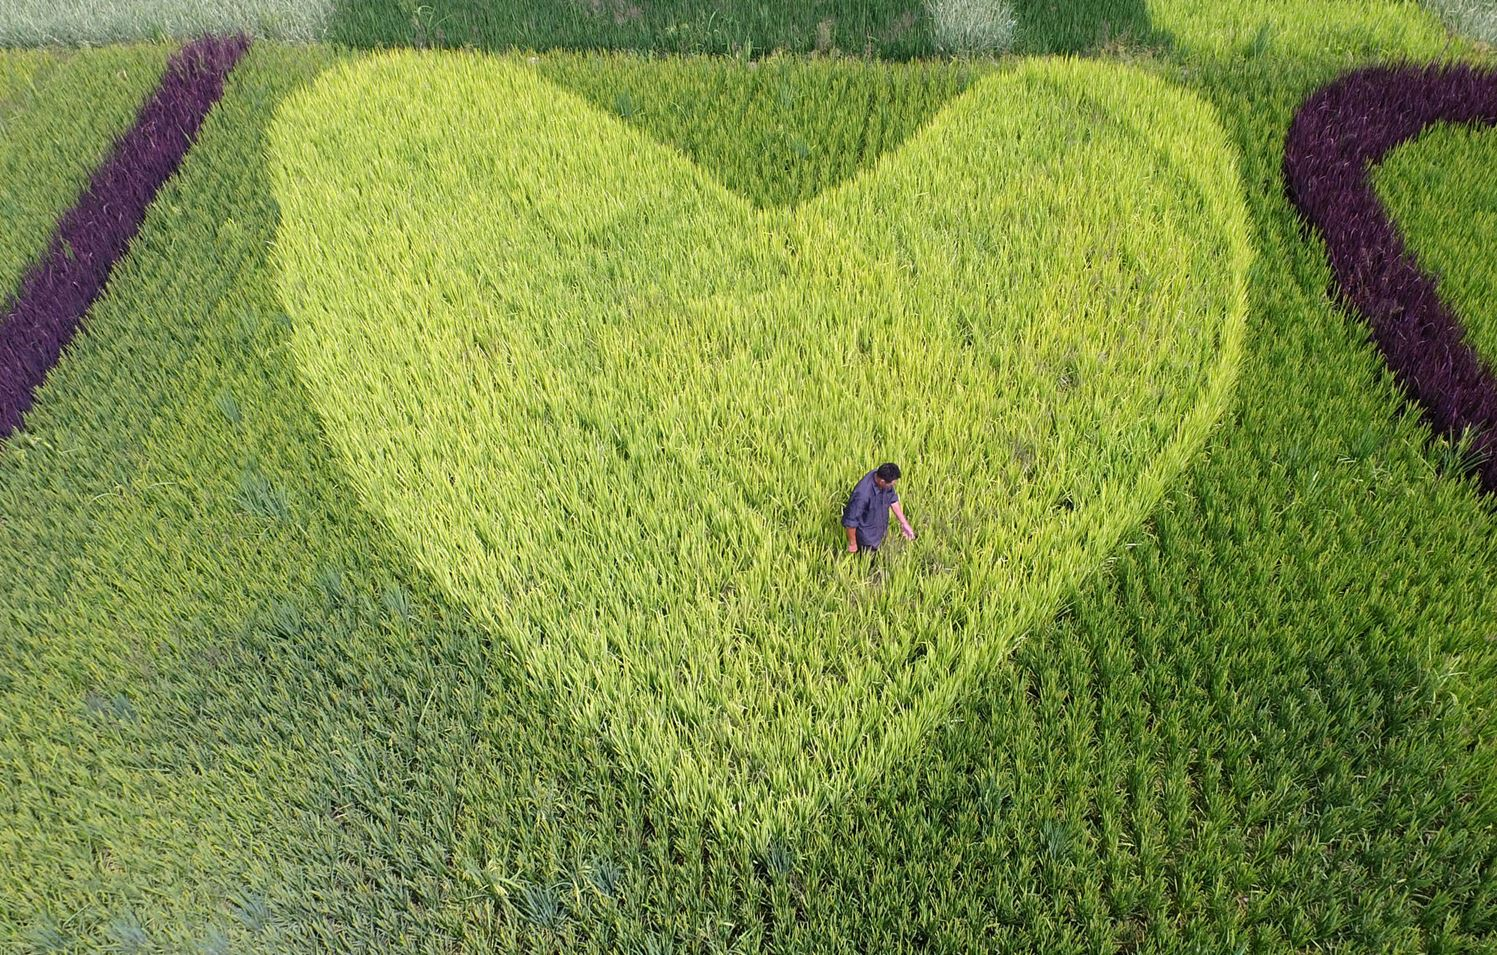 Рис, посаженный в виде сердечка. Г. о. Тайчжоу, пр. Чжэцзян.